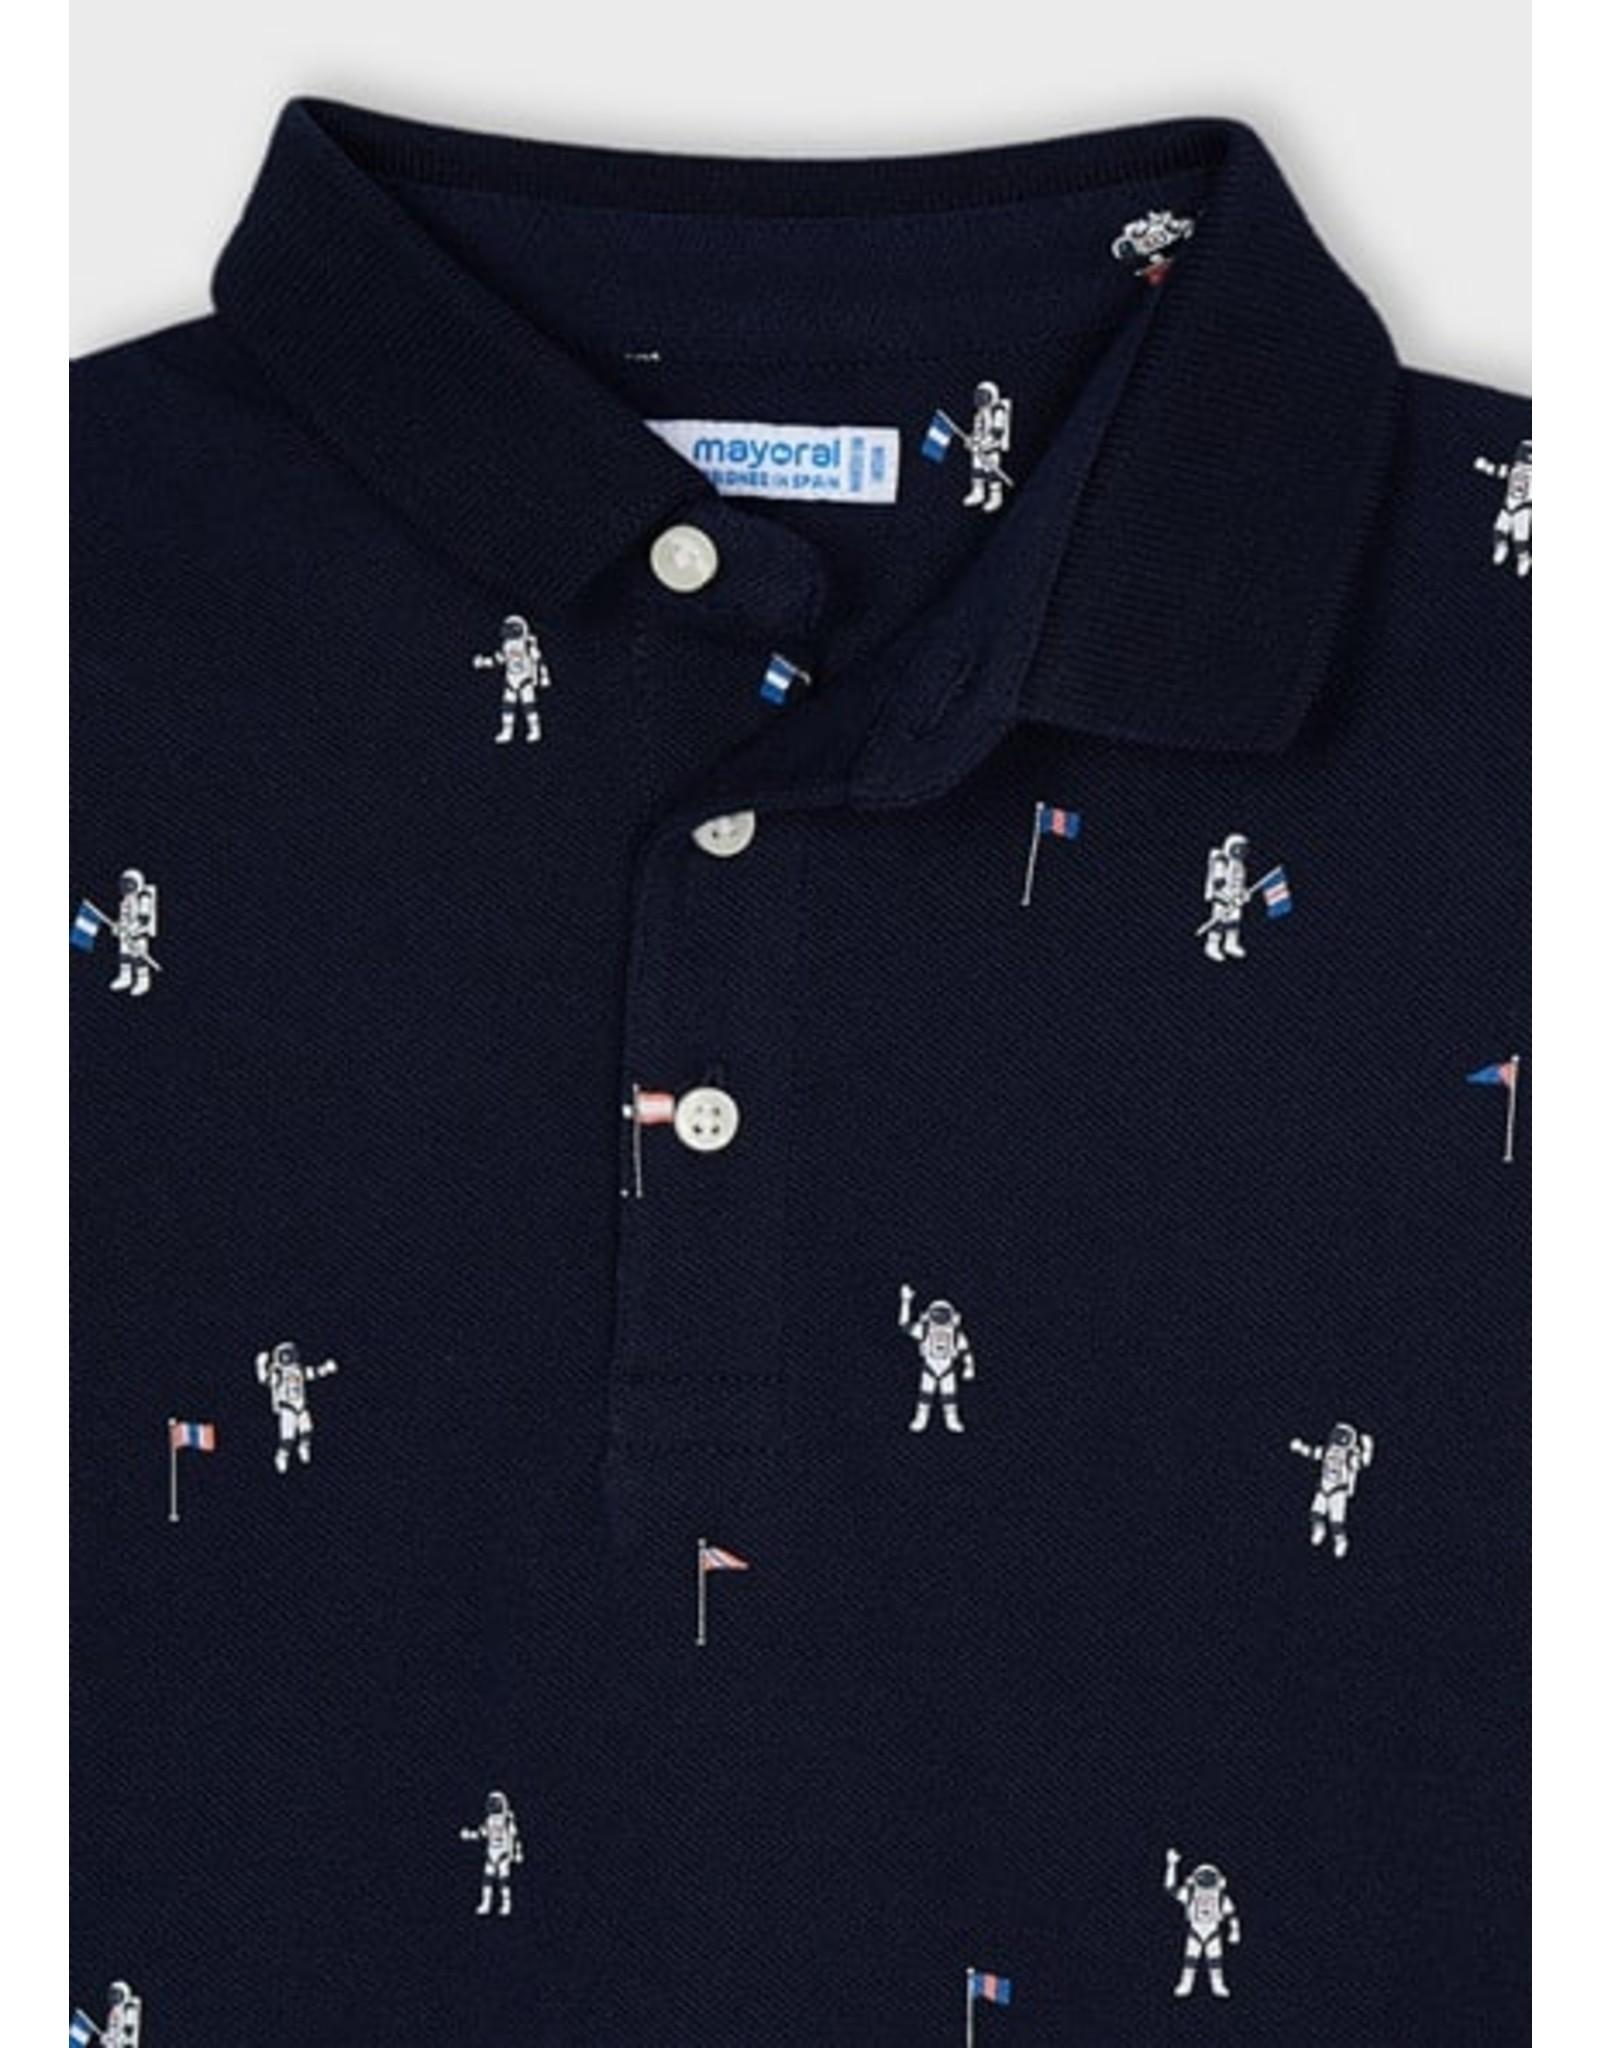 Mayoral Polo astronaut donkerblauw